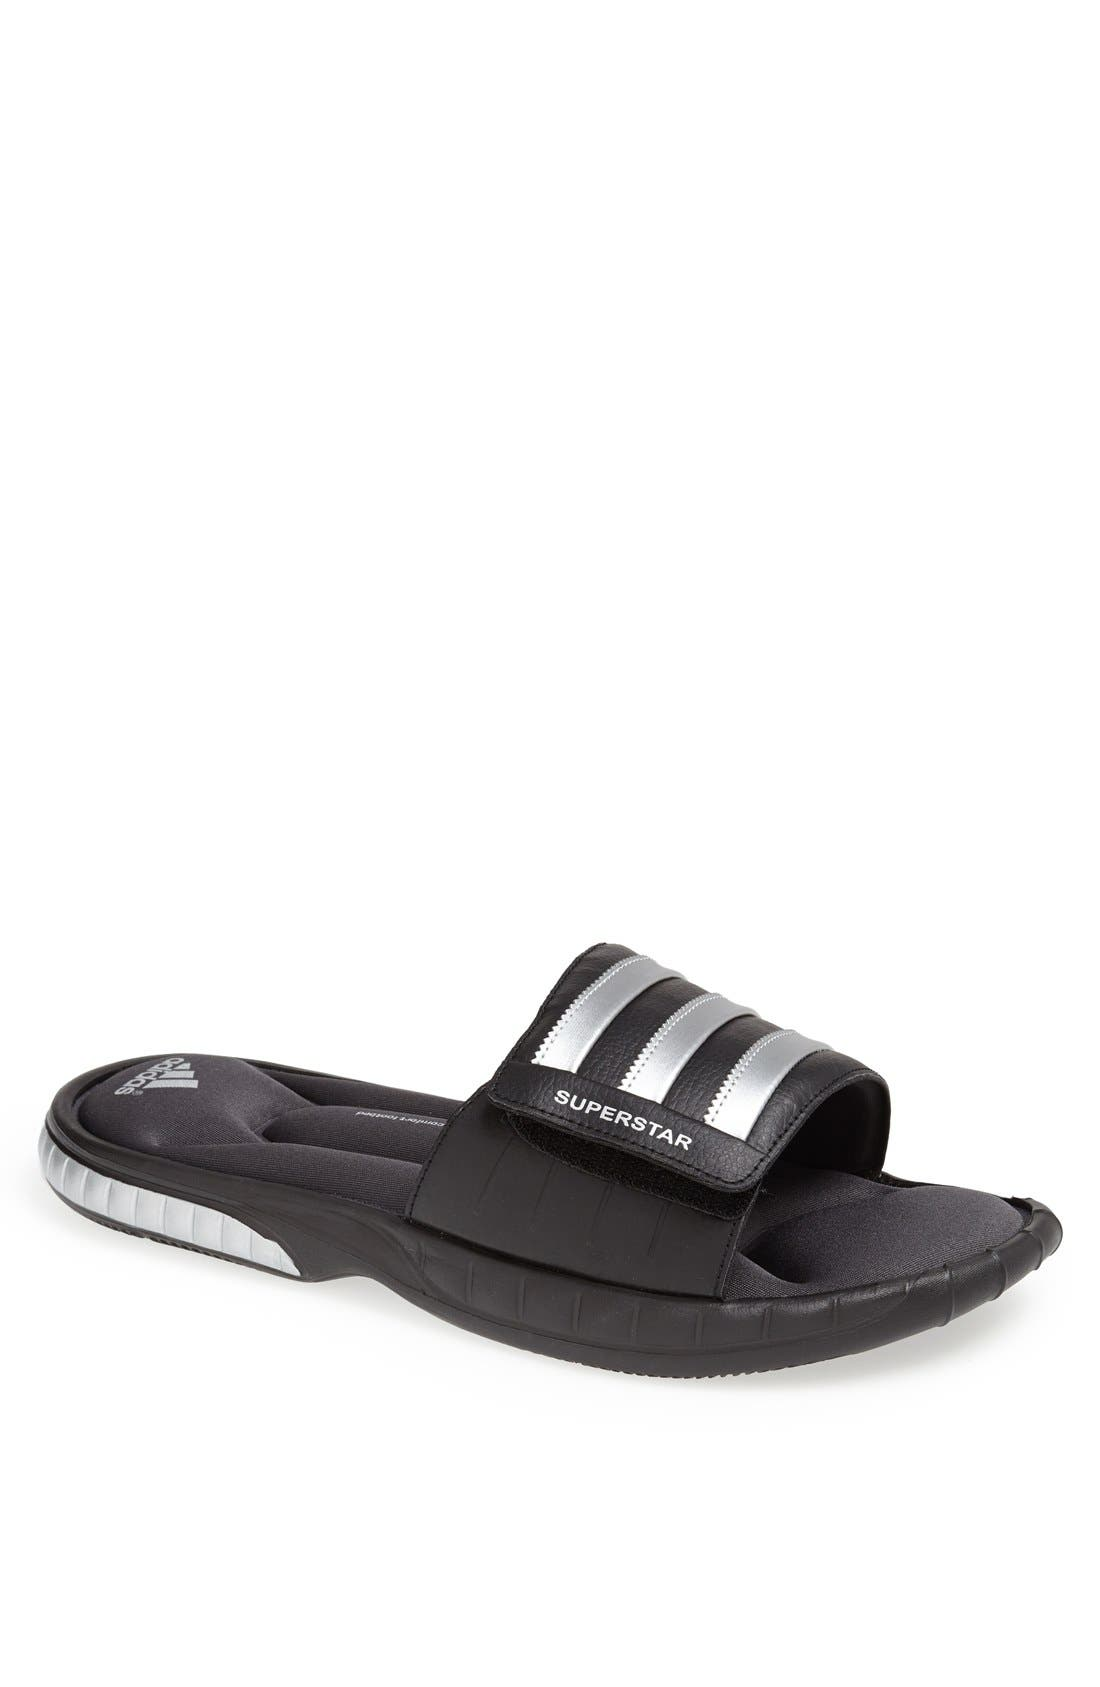 adidas superstar slide sandals